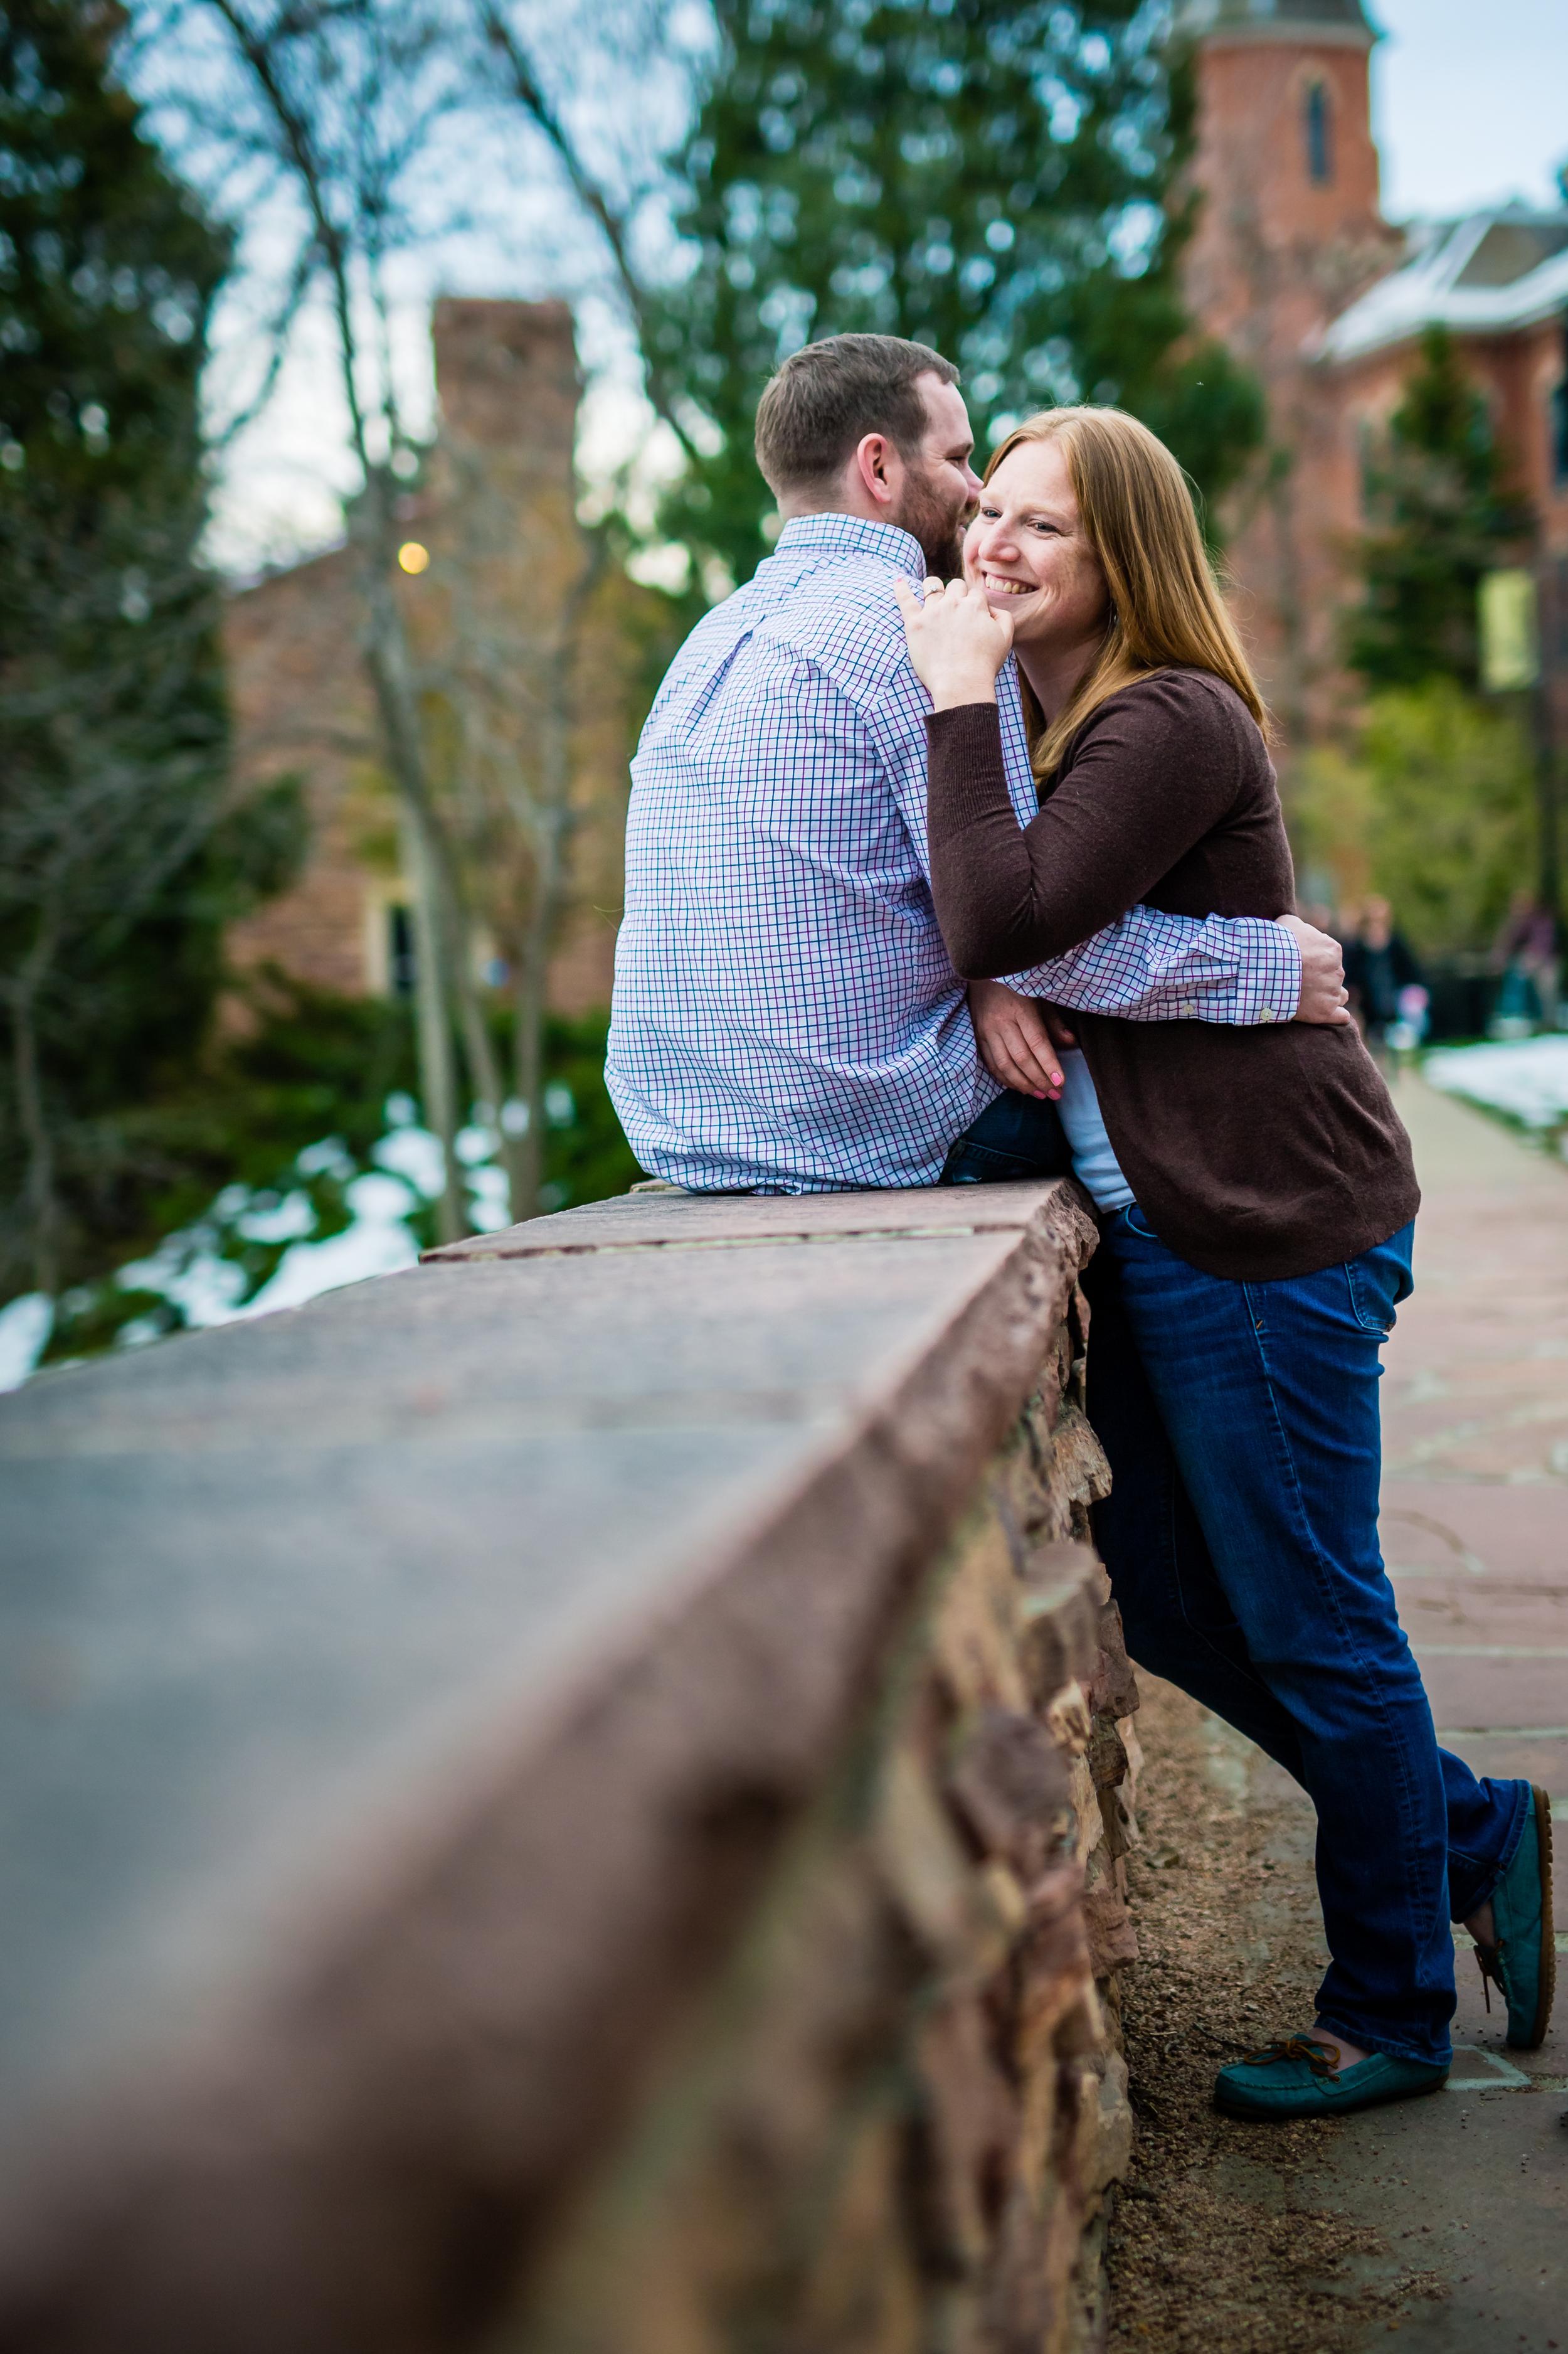 Engagements taken at CU in Boulder Colorado.